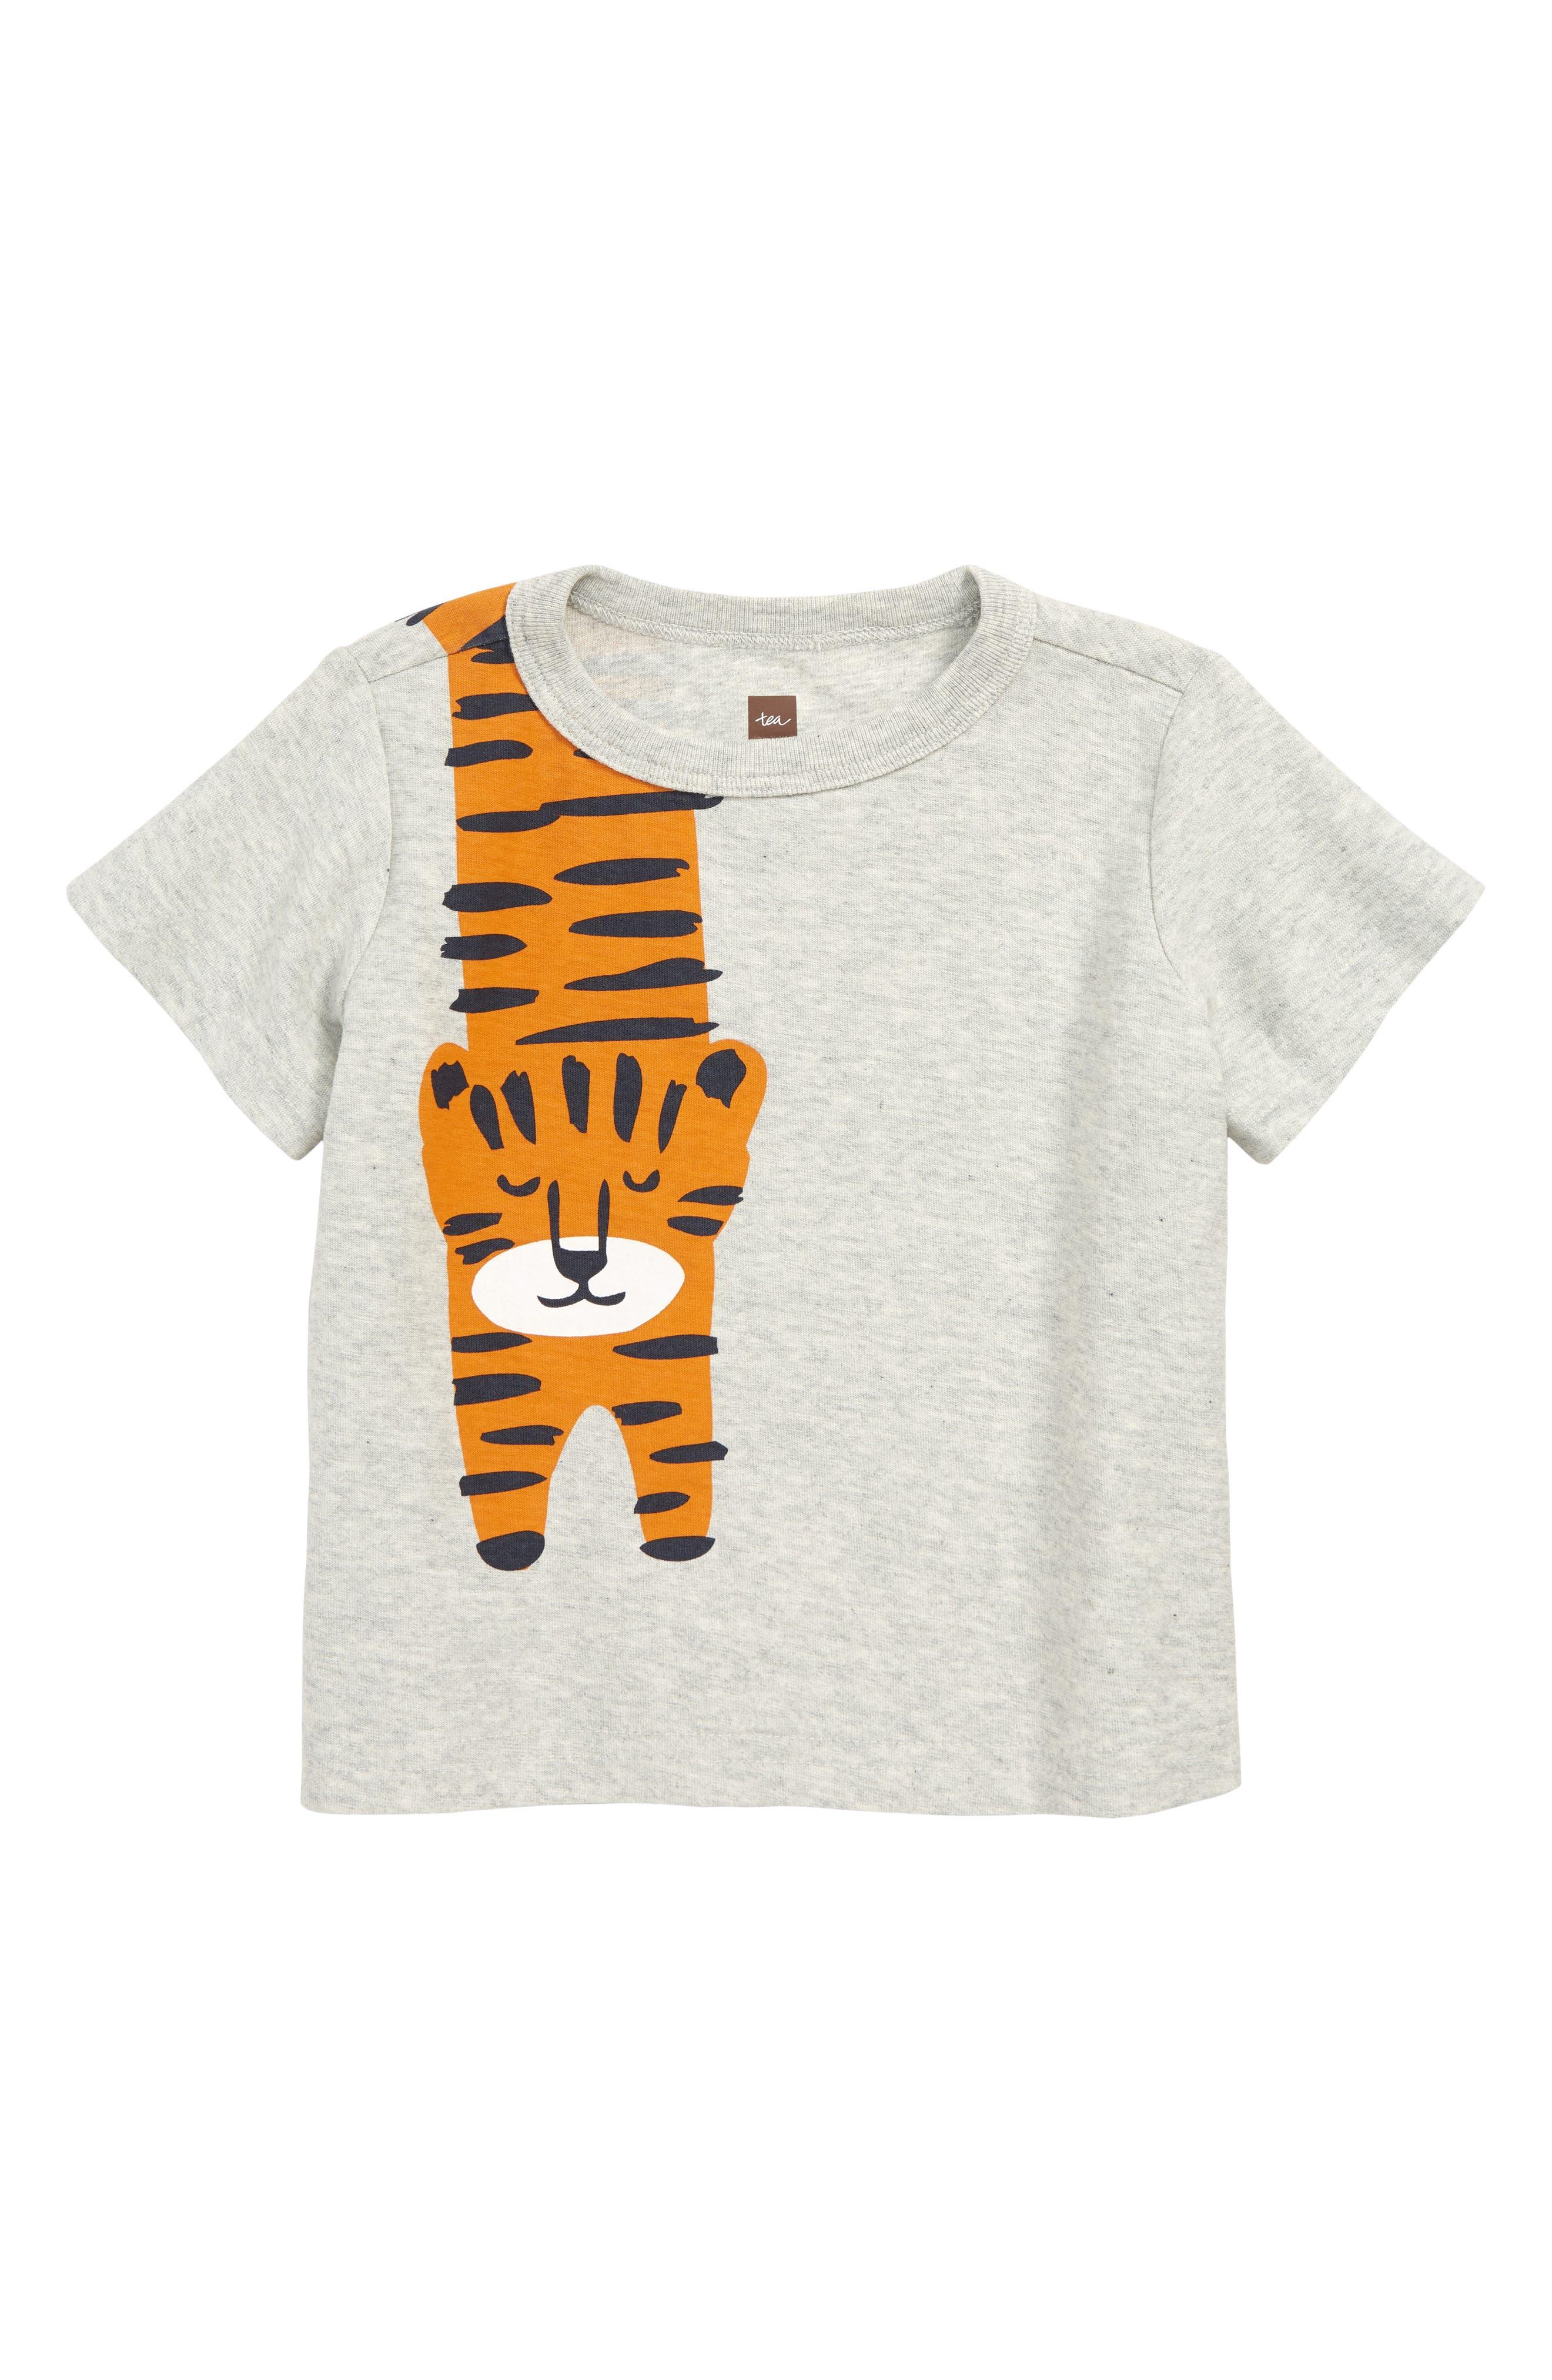 9b01ceef Baby Boy Grey Shirts & Tops: Poplin, Print & Flannel | Nordstrom